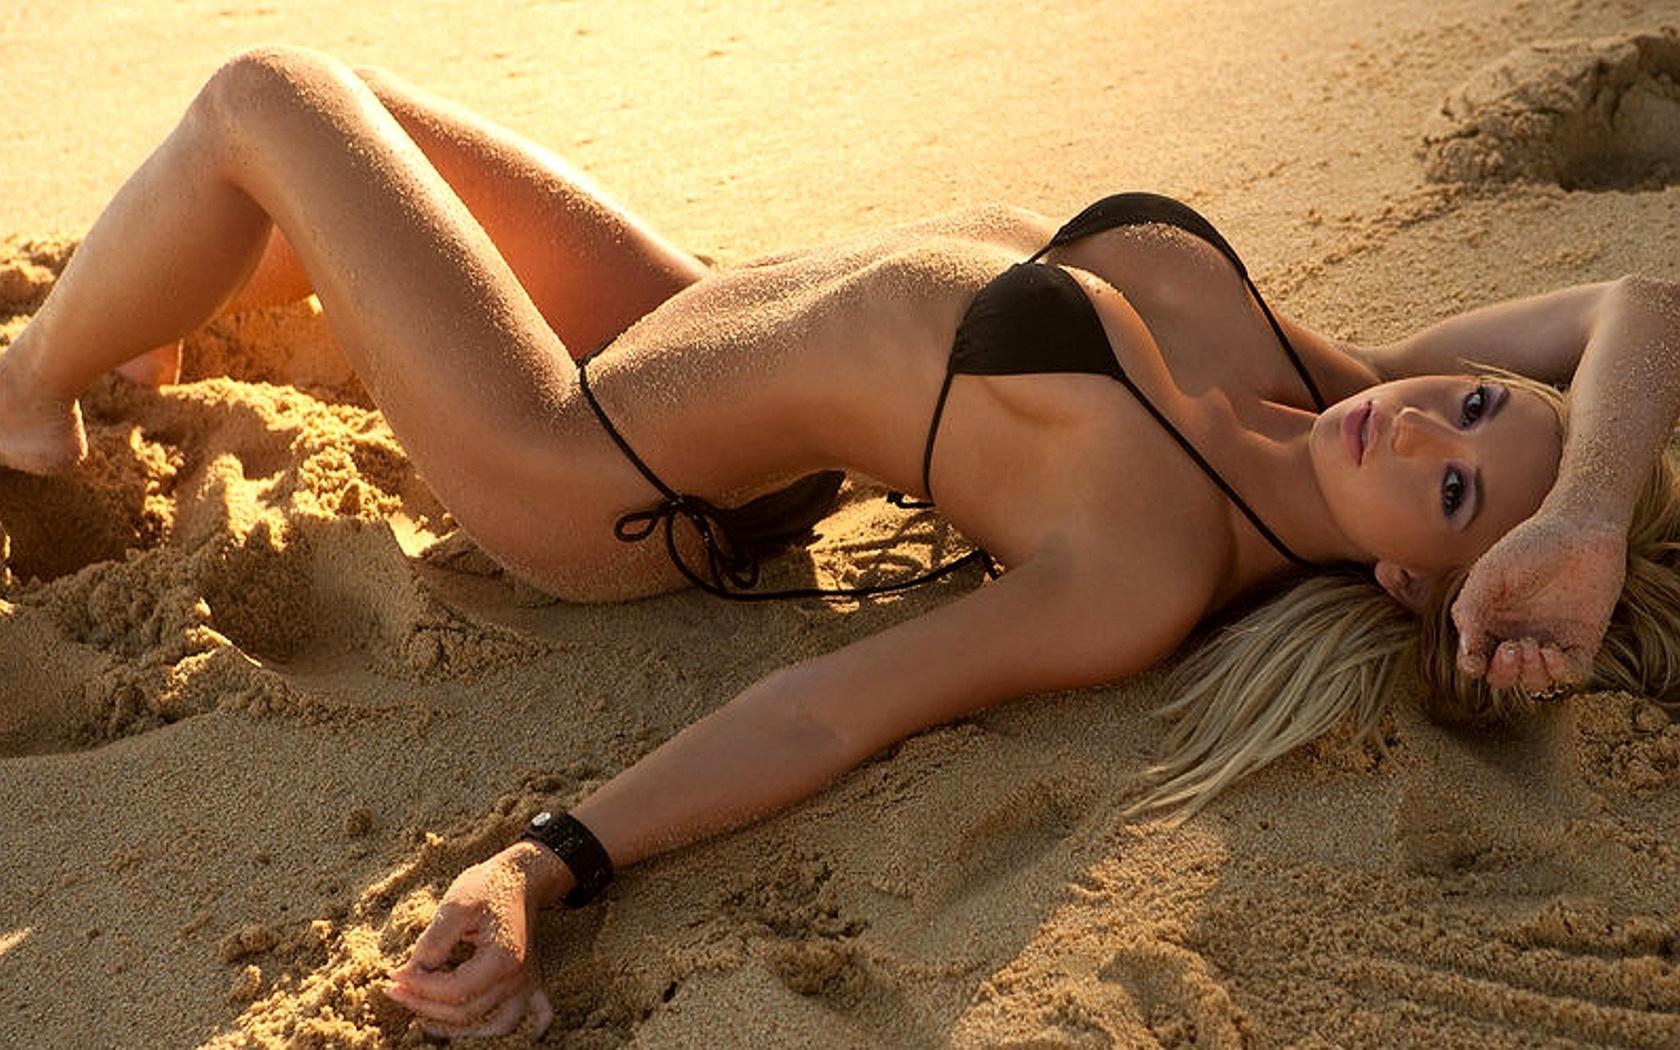 Рассказ о сексе на пляже, Секс на пляже (рассказ) 28 фотография